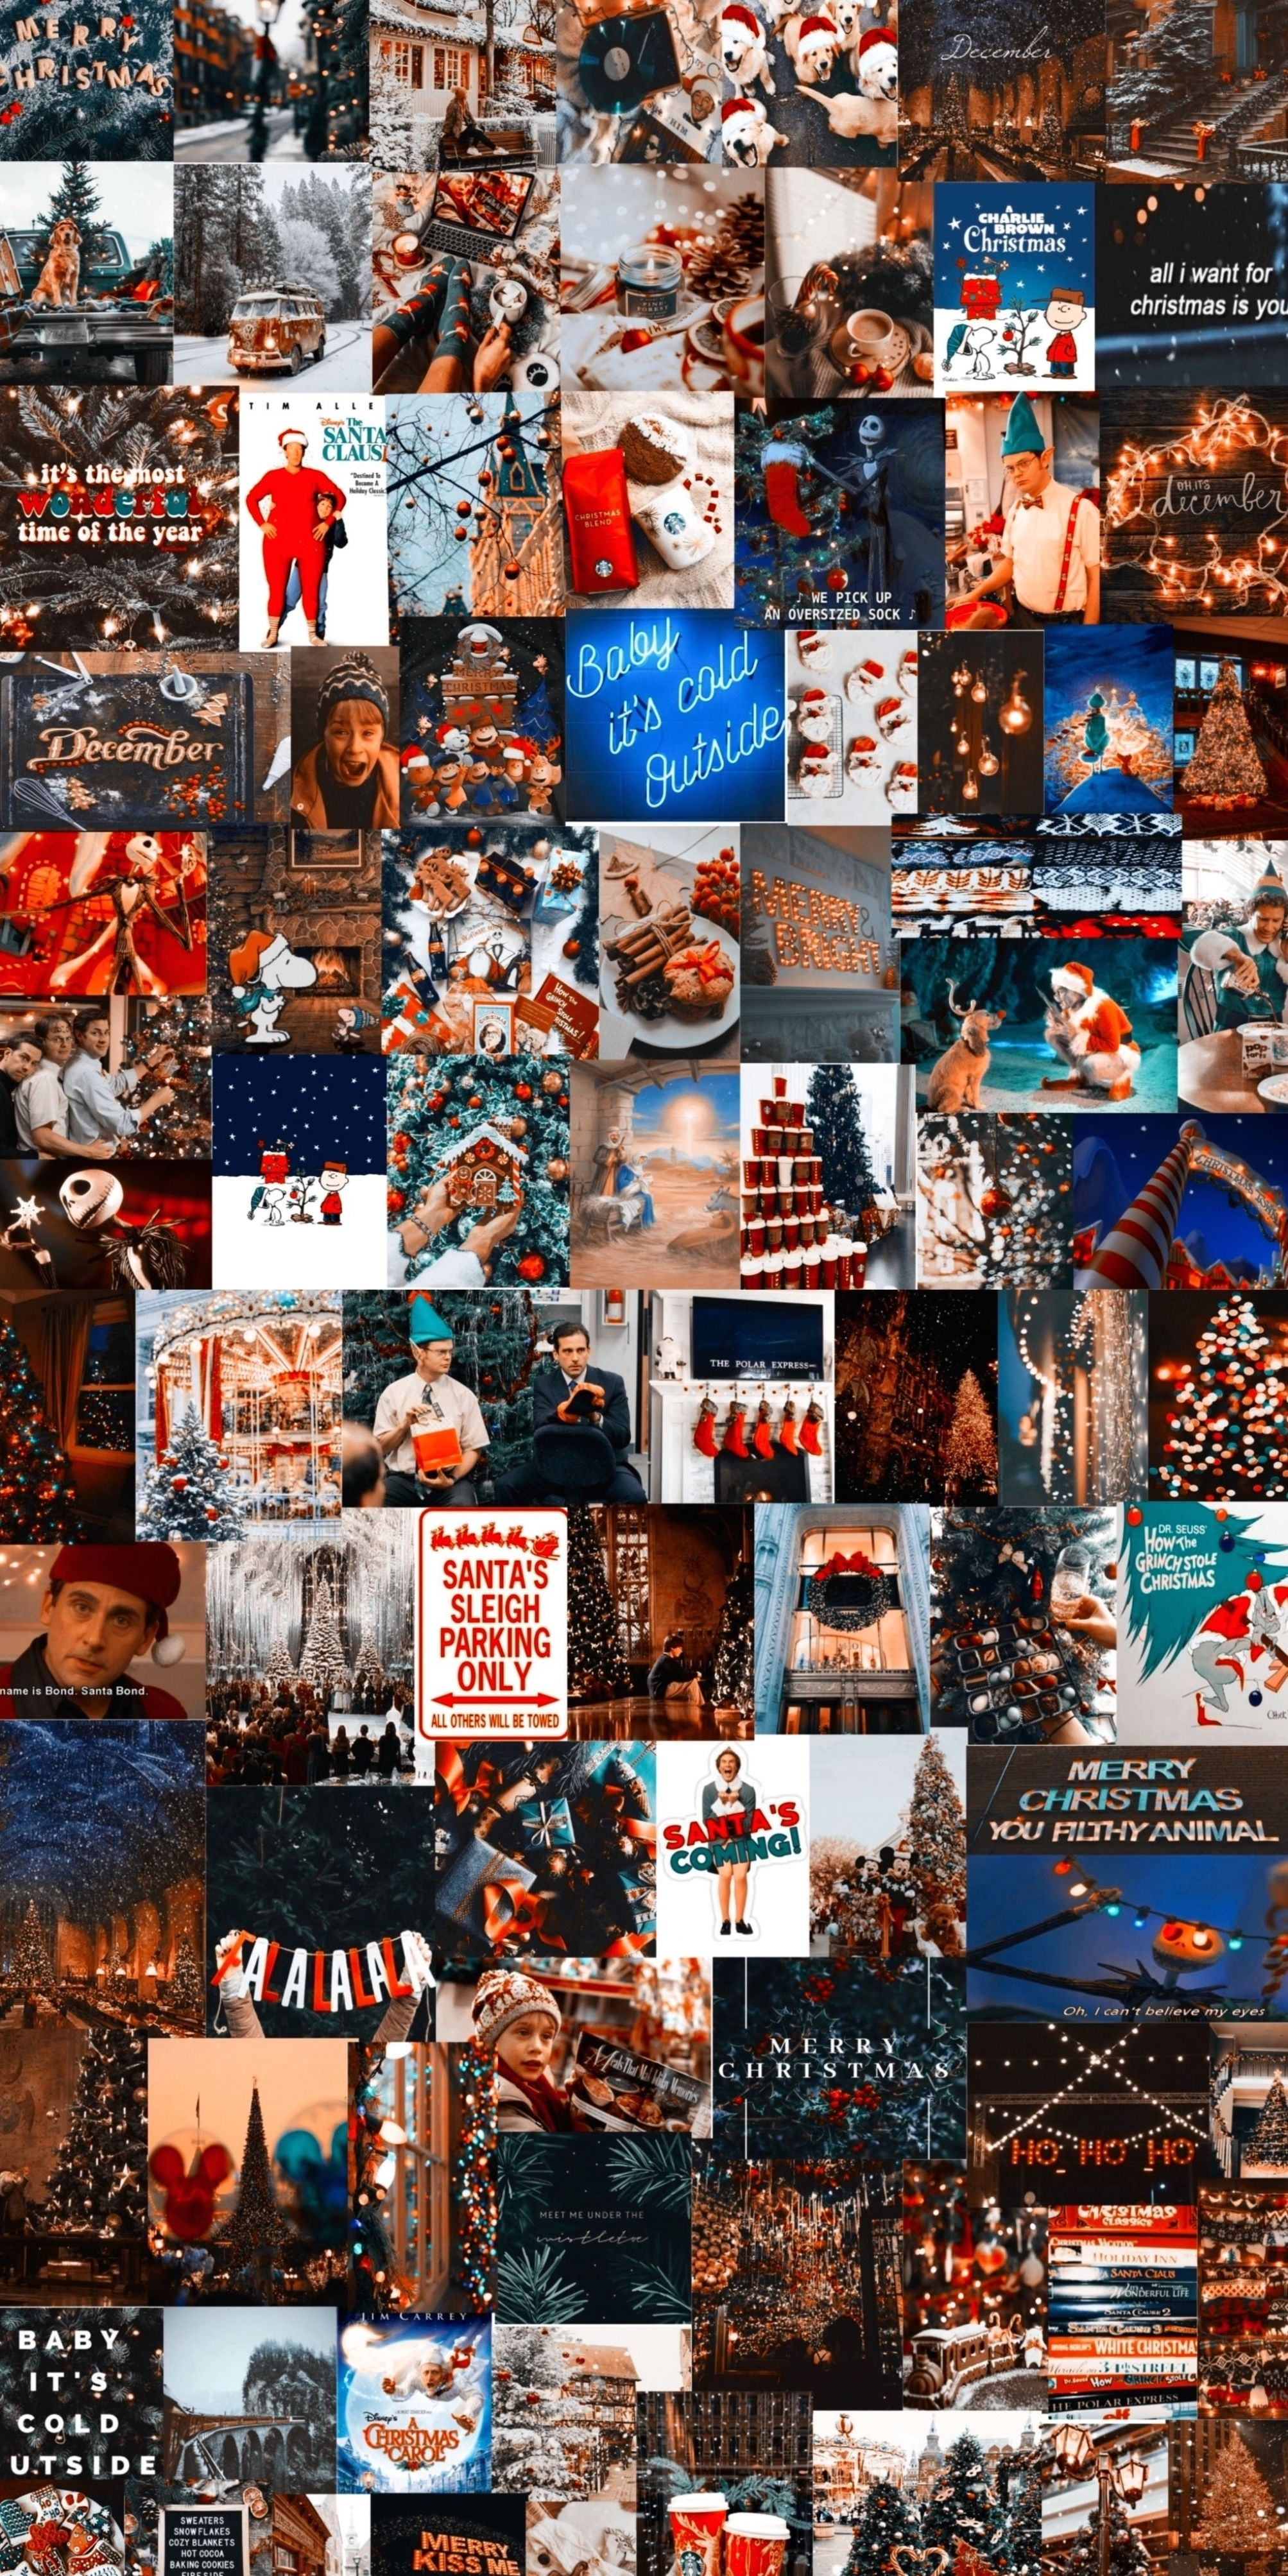 Christmas Wallpaper/Screensaver